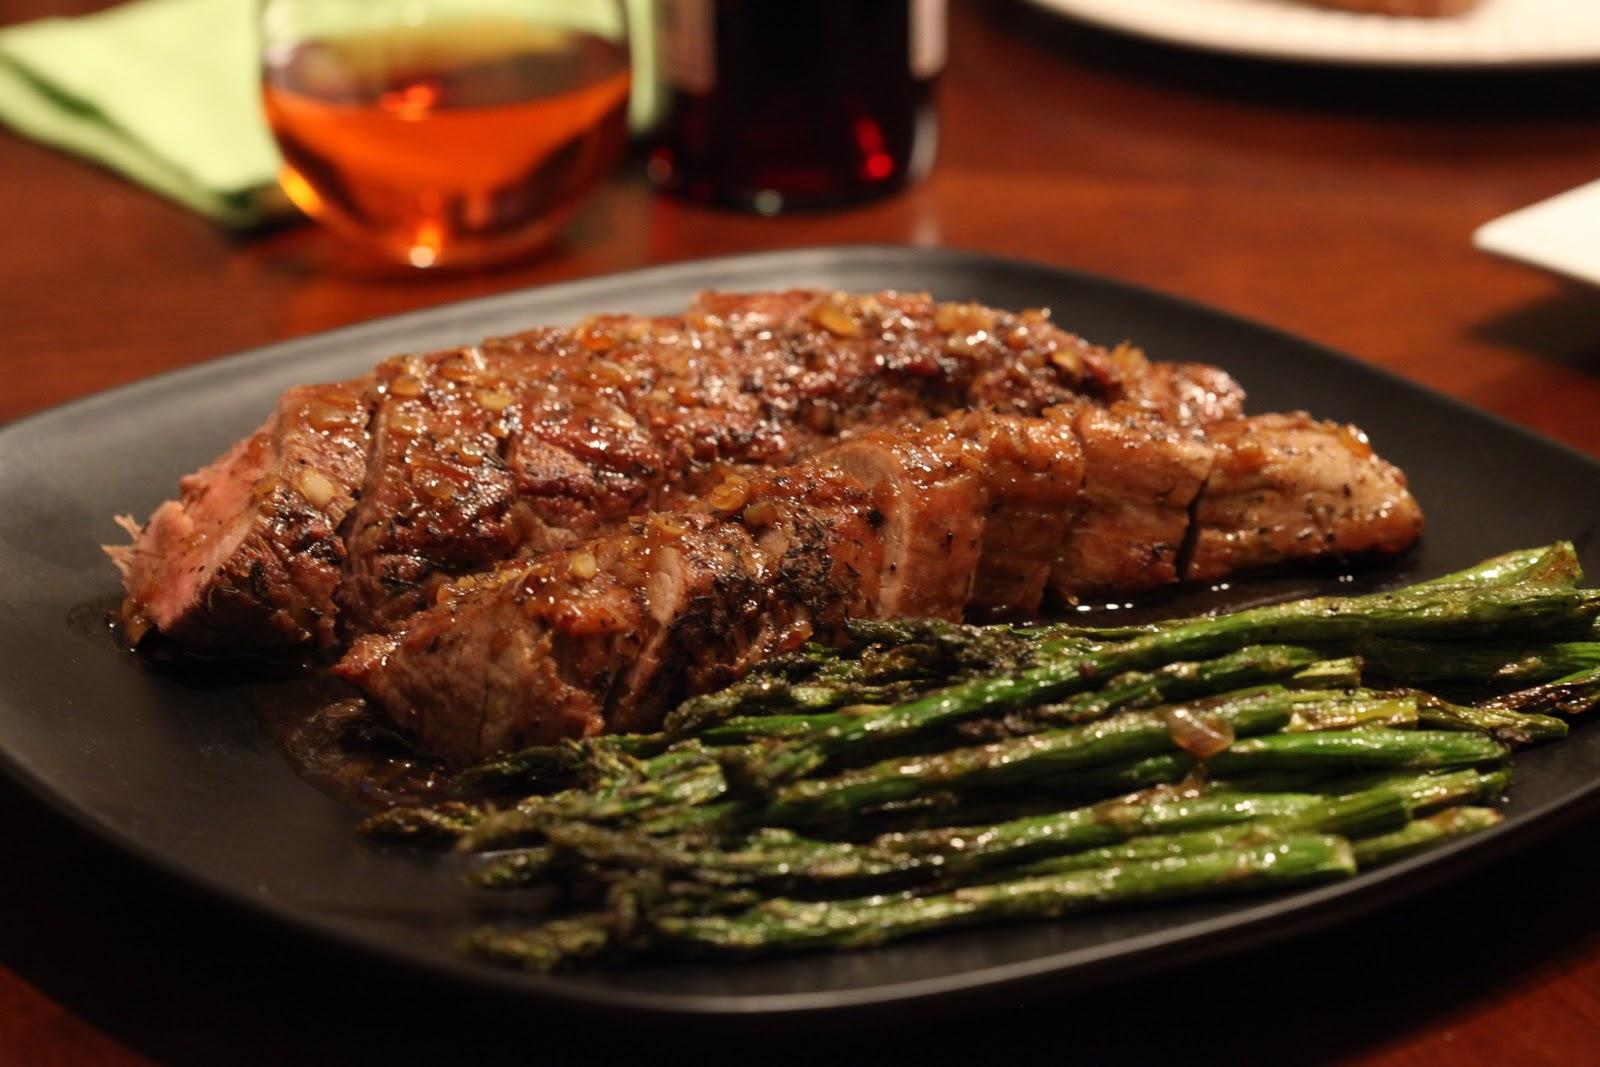 Bo's Bowl: Pork Tenderloin with Maple Dijon Glaze